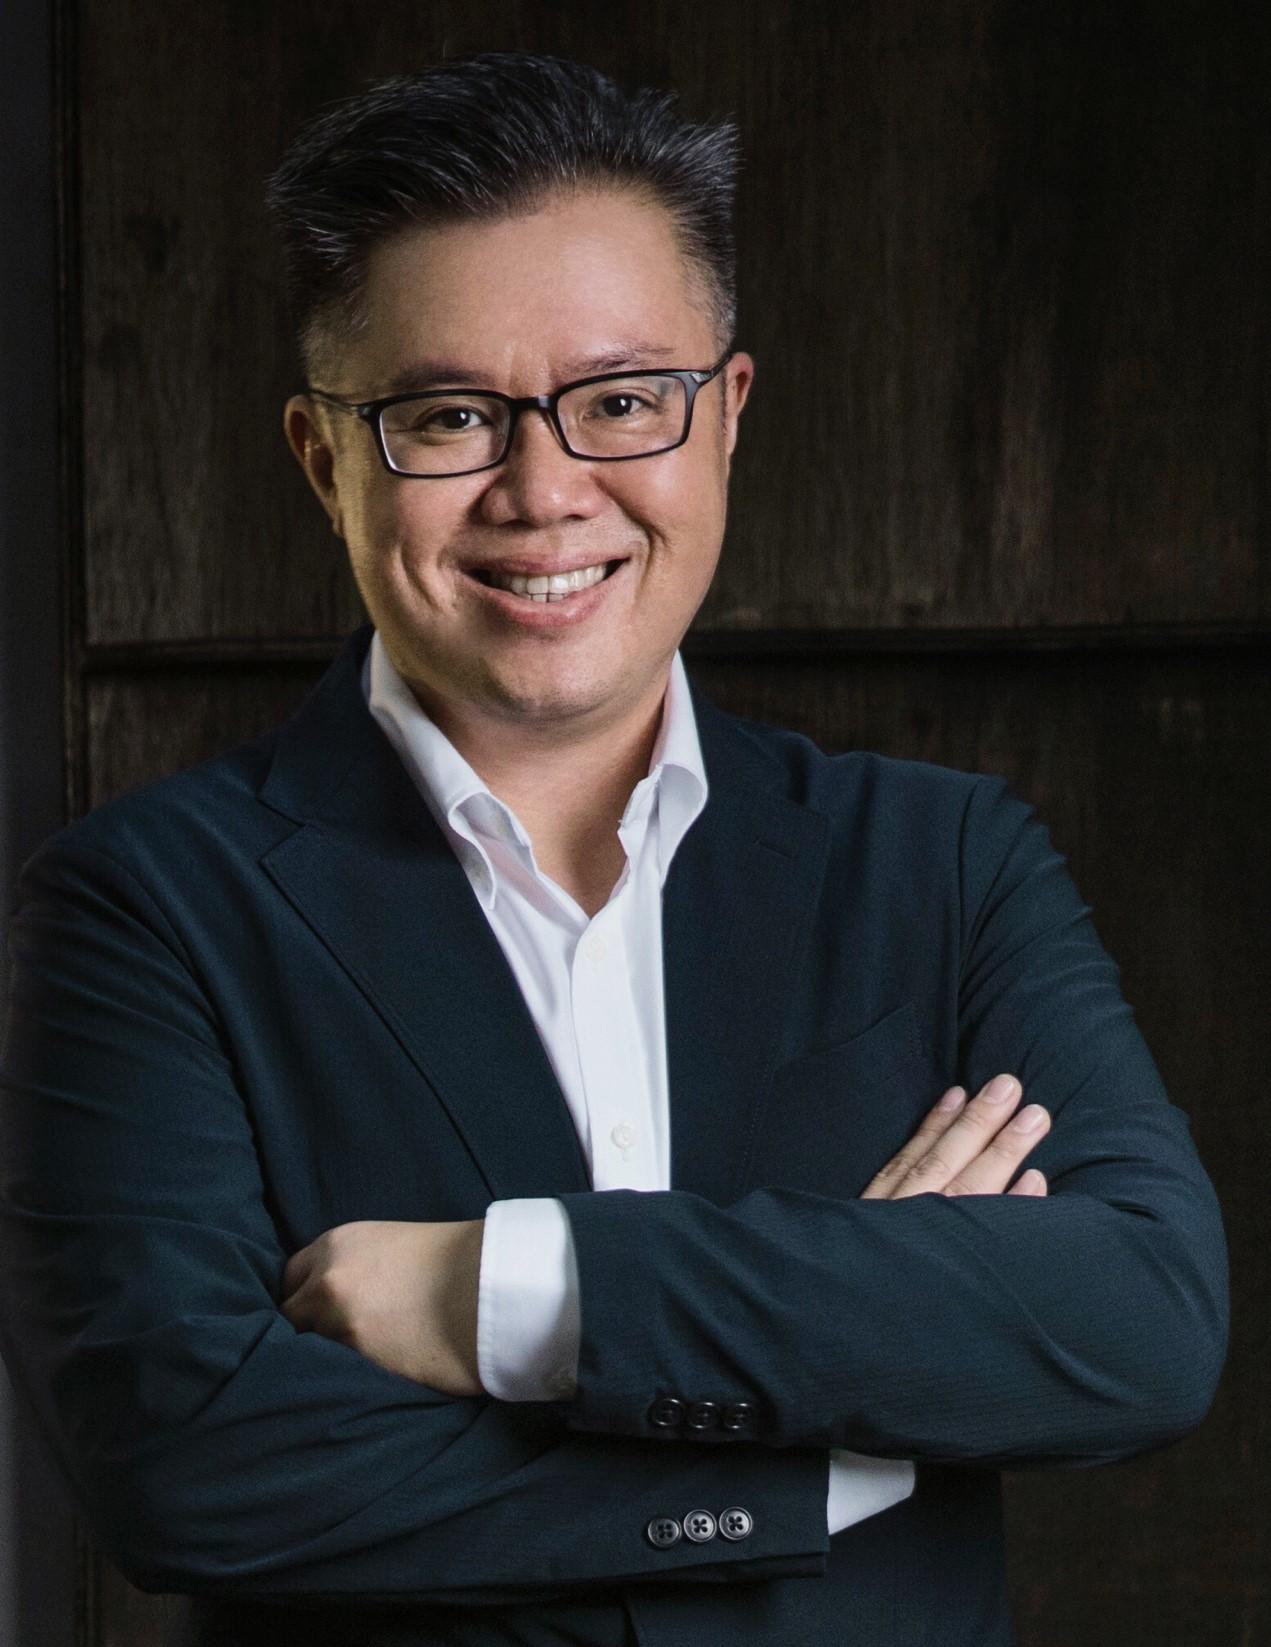 DANIEL SURYA, CEO WIR GROUP